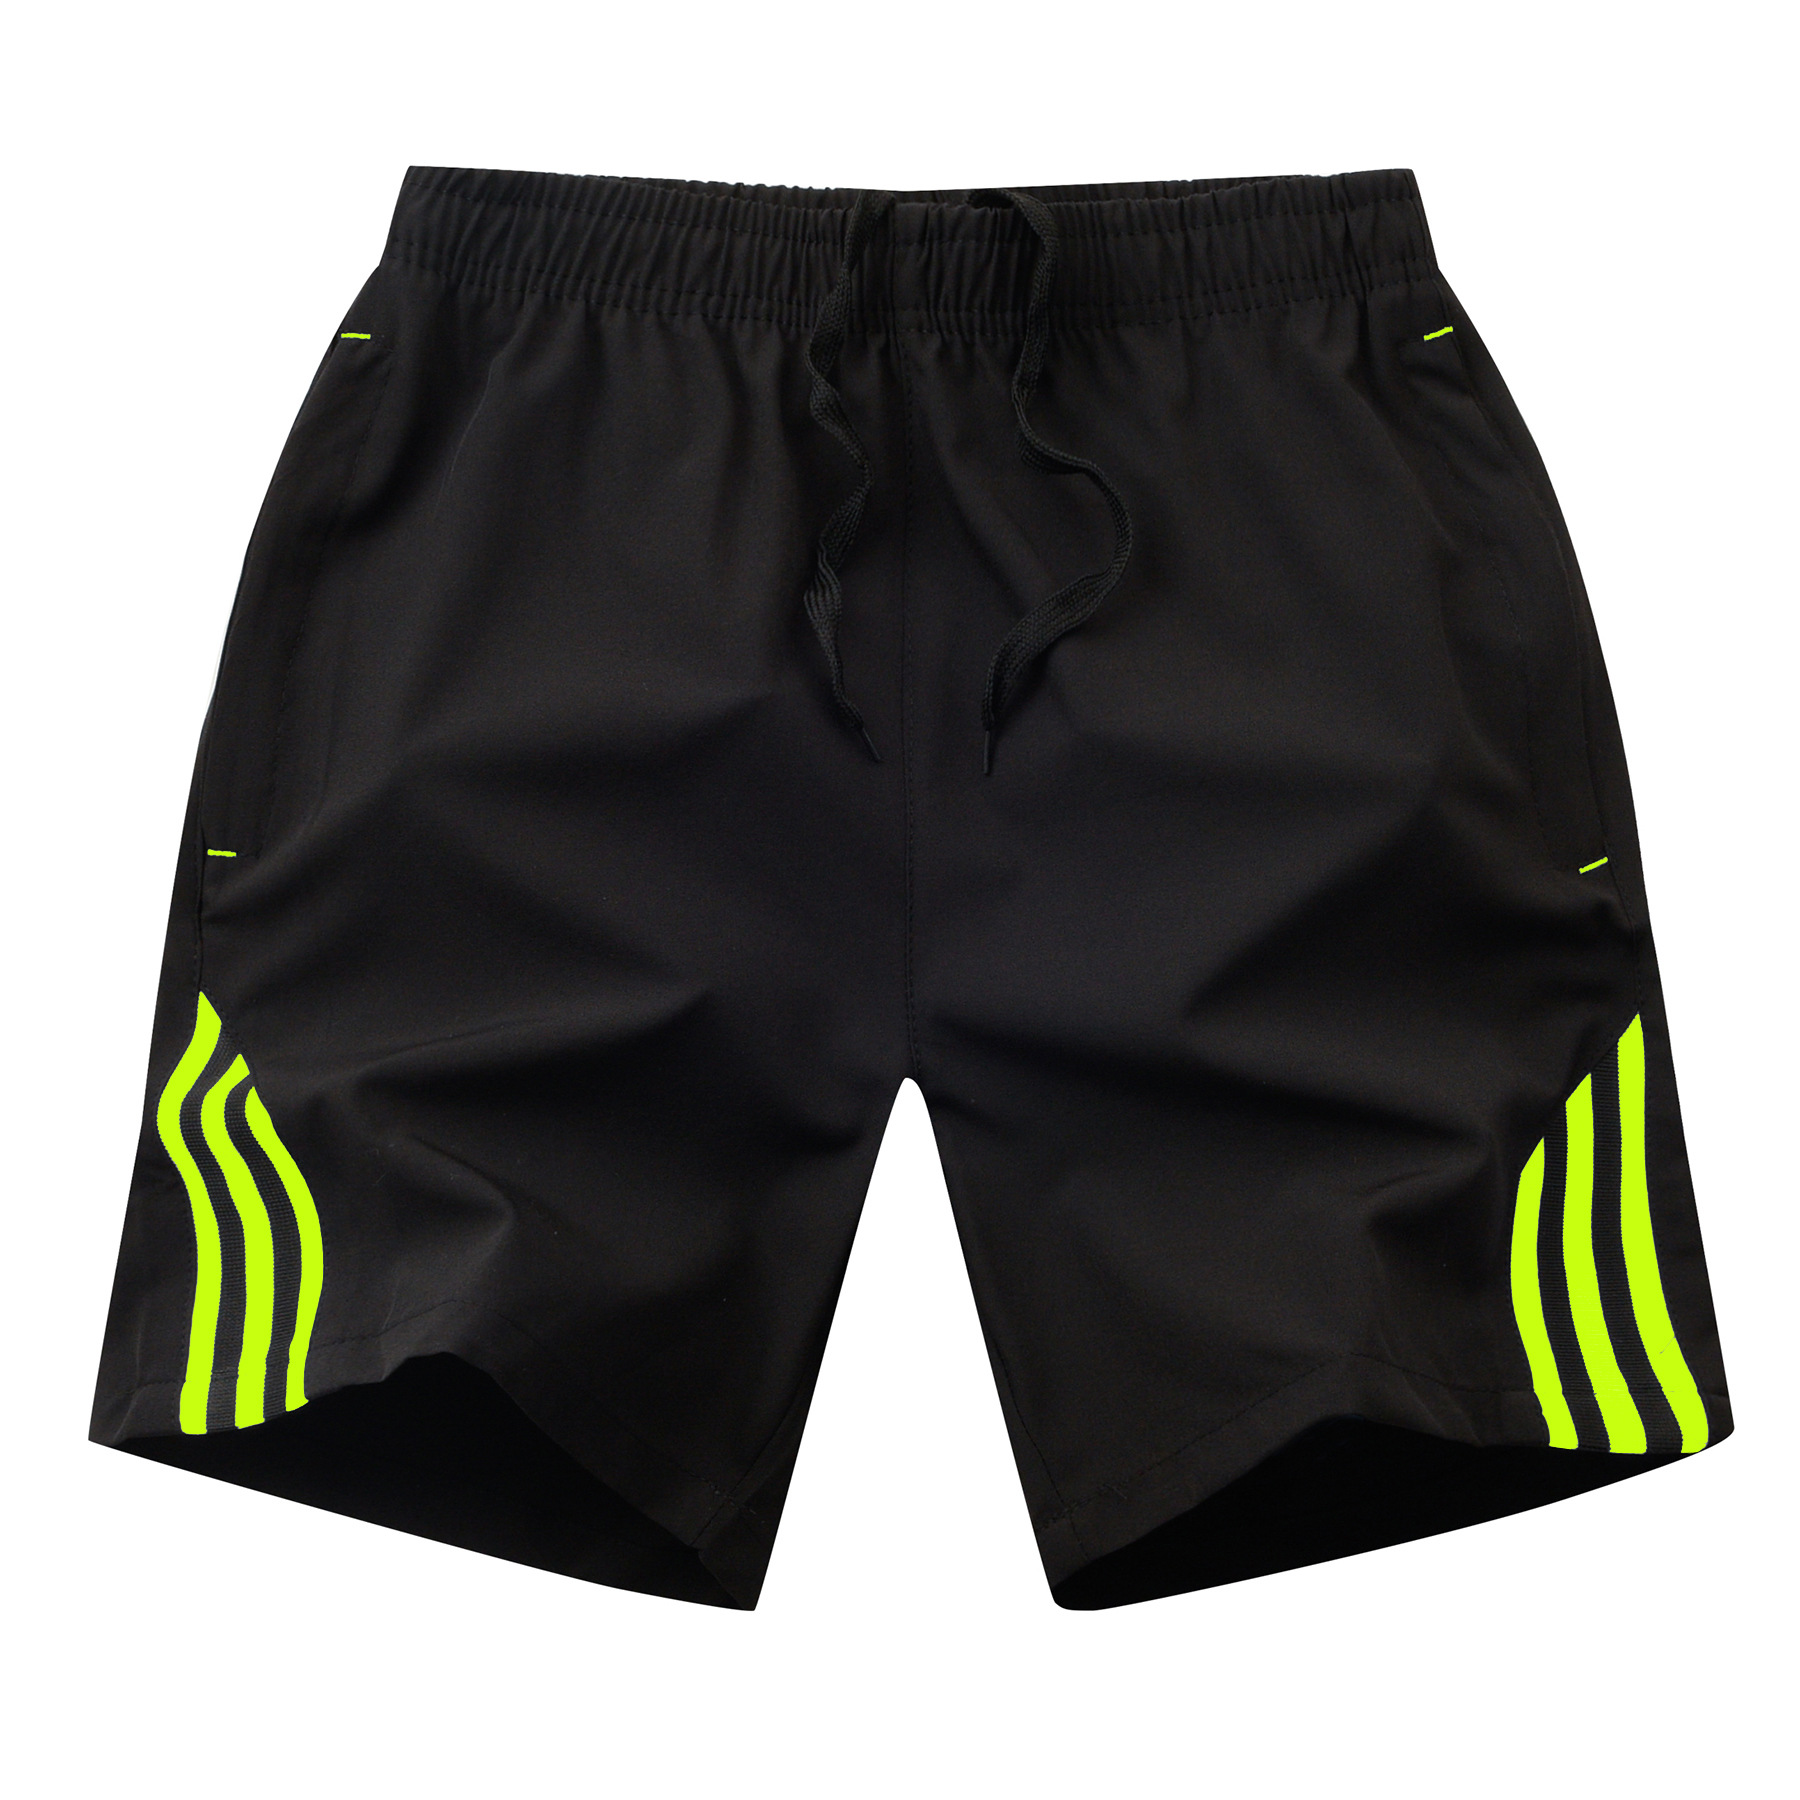 Men's Shorts Summer Fitness Training For Runners Training Shorts Fitness Men's Beach Shorts Training Breathable Running Shorts